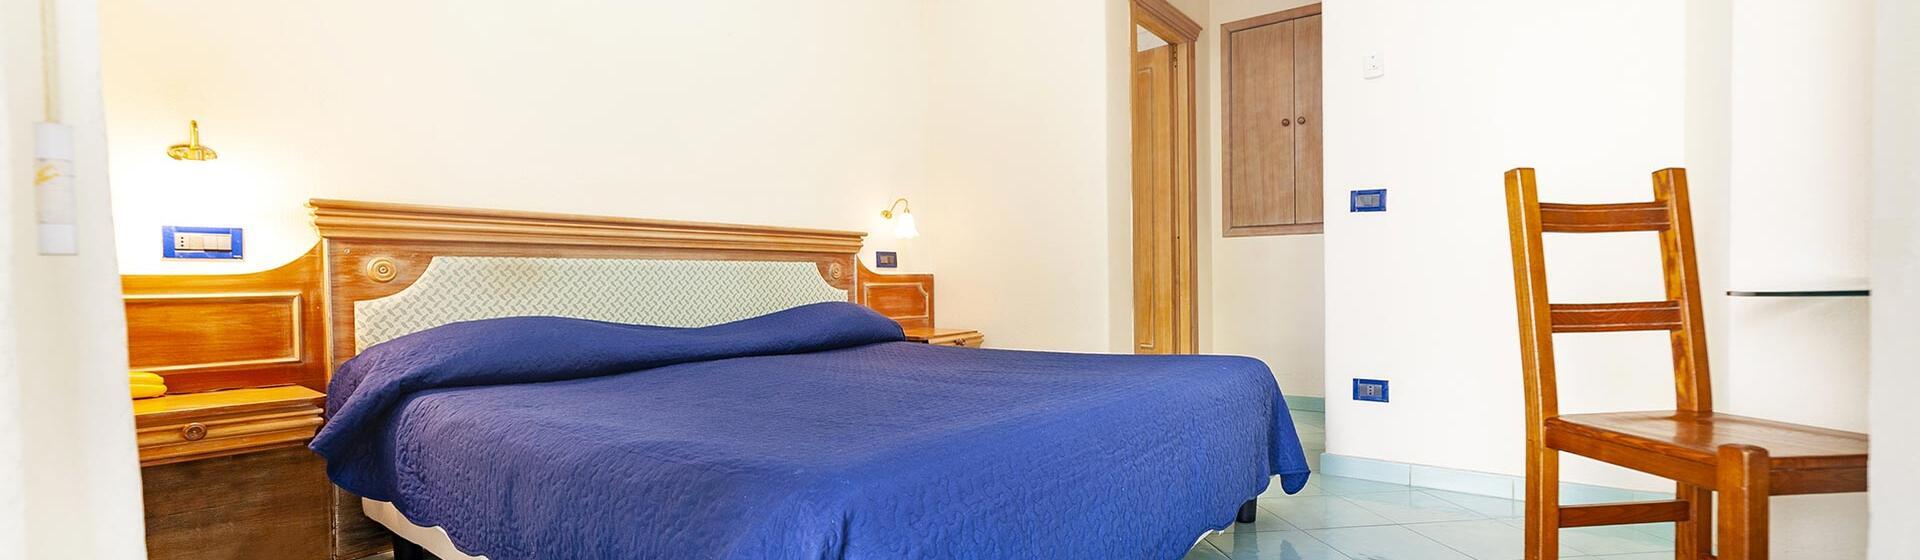 hoteldonpepe fr pavillon 005